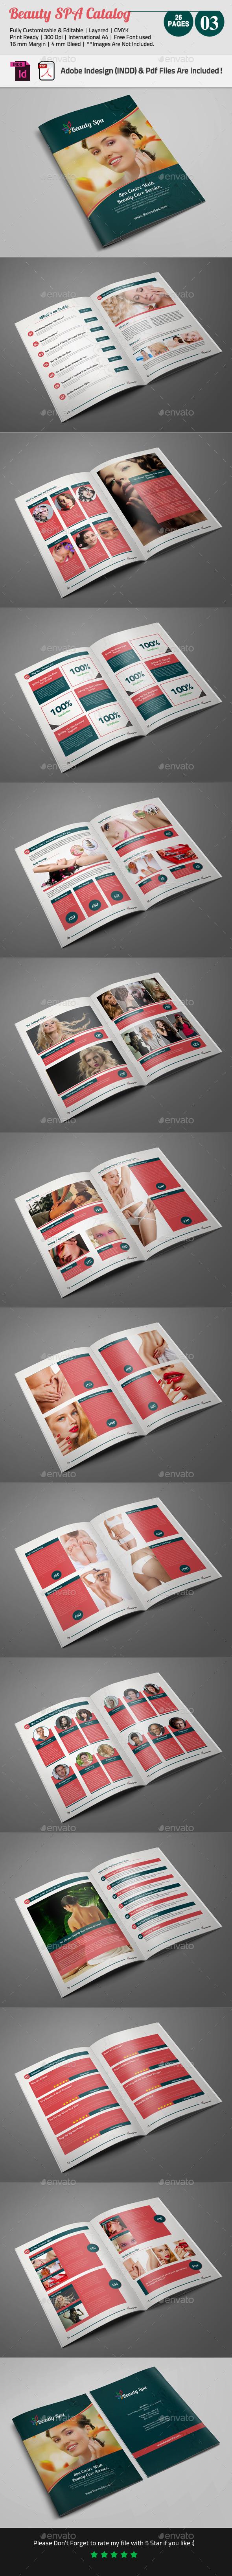 GraphicRiver Beauty SPA Catalog 03 8823348